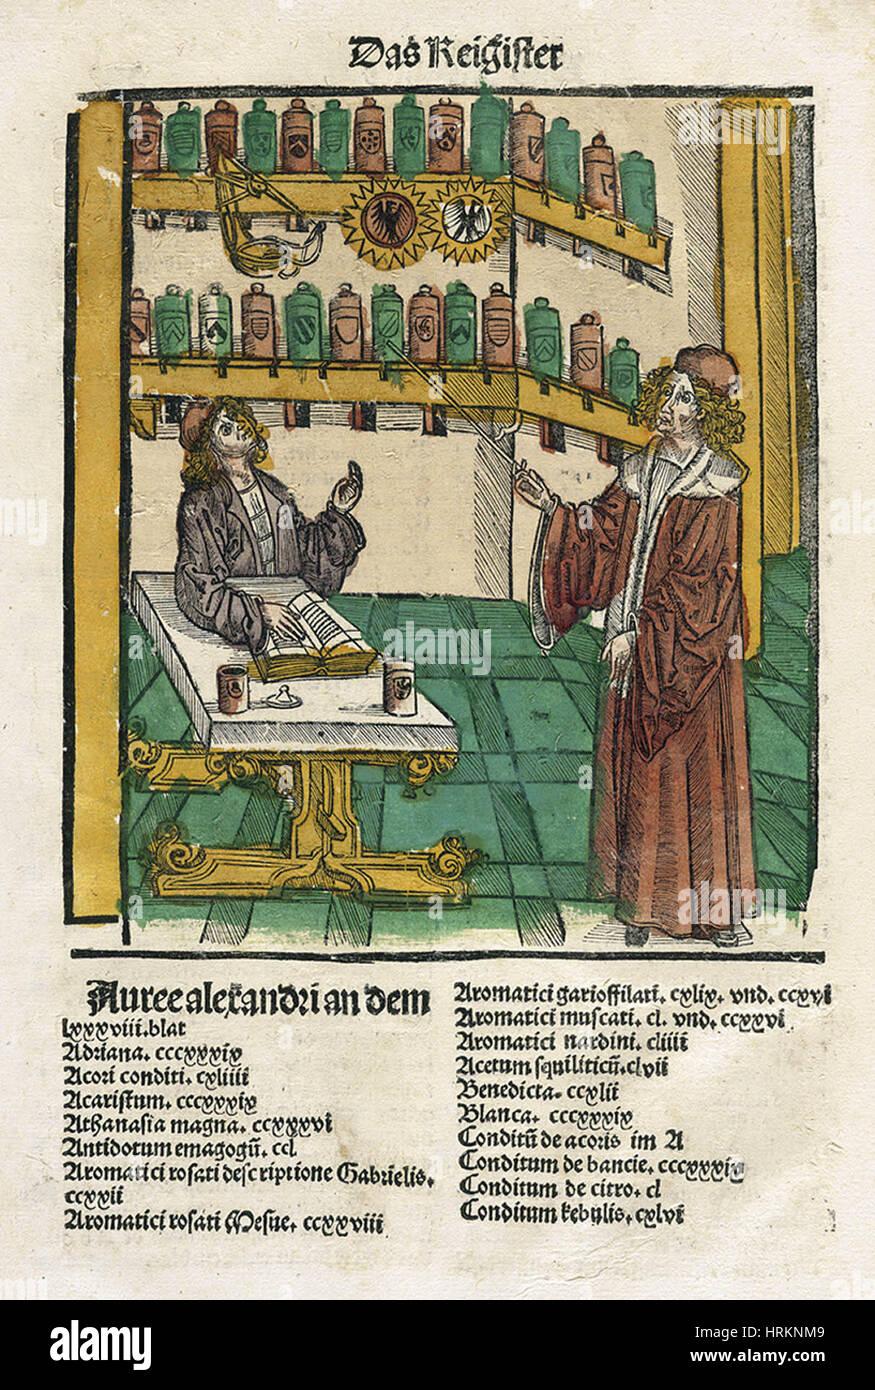 Alchemy - Stock Image